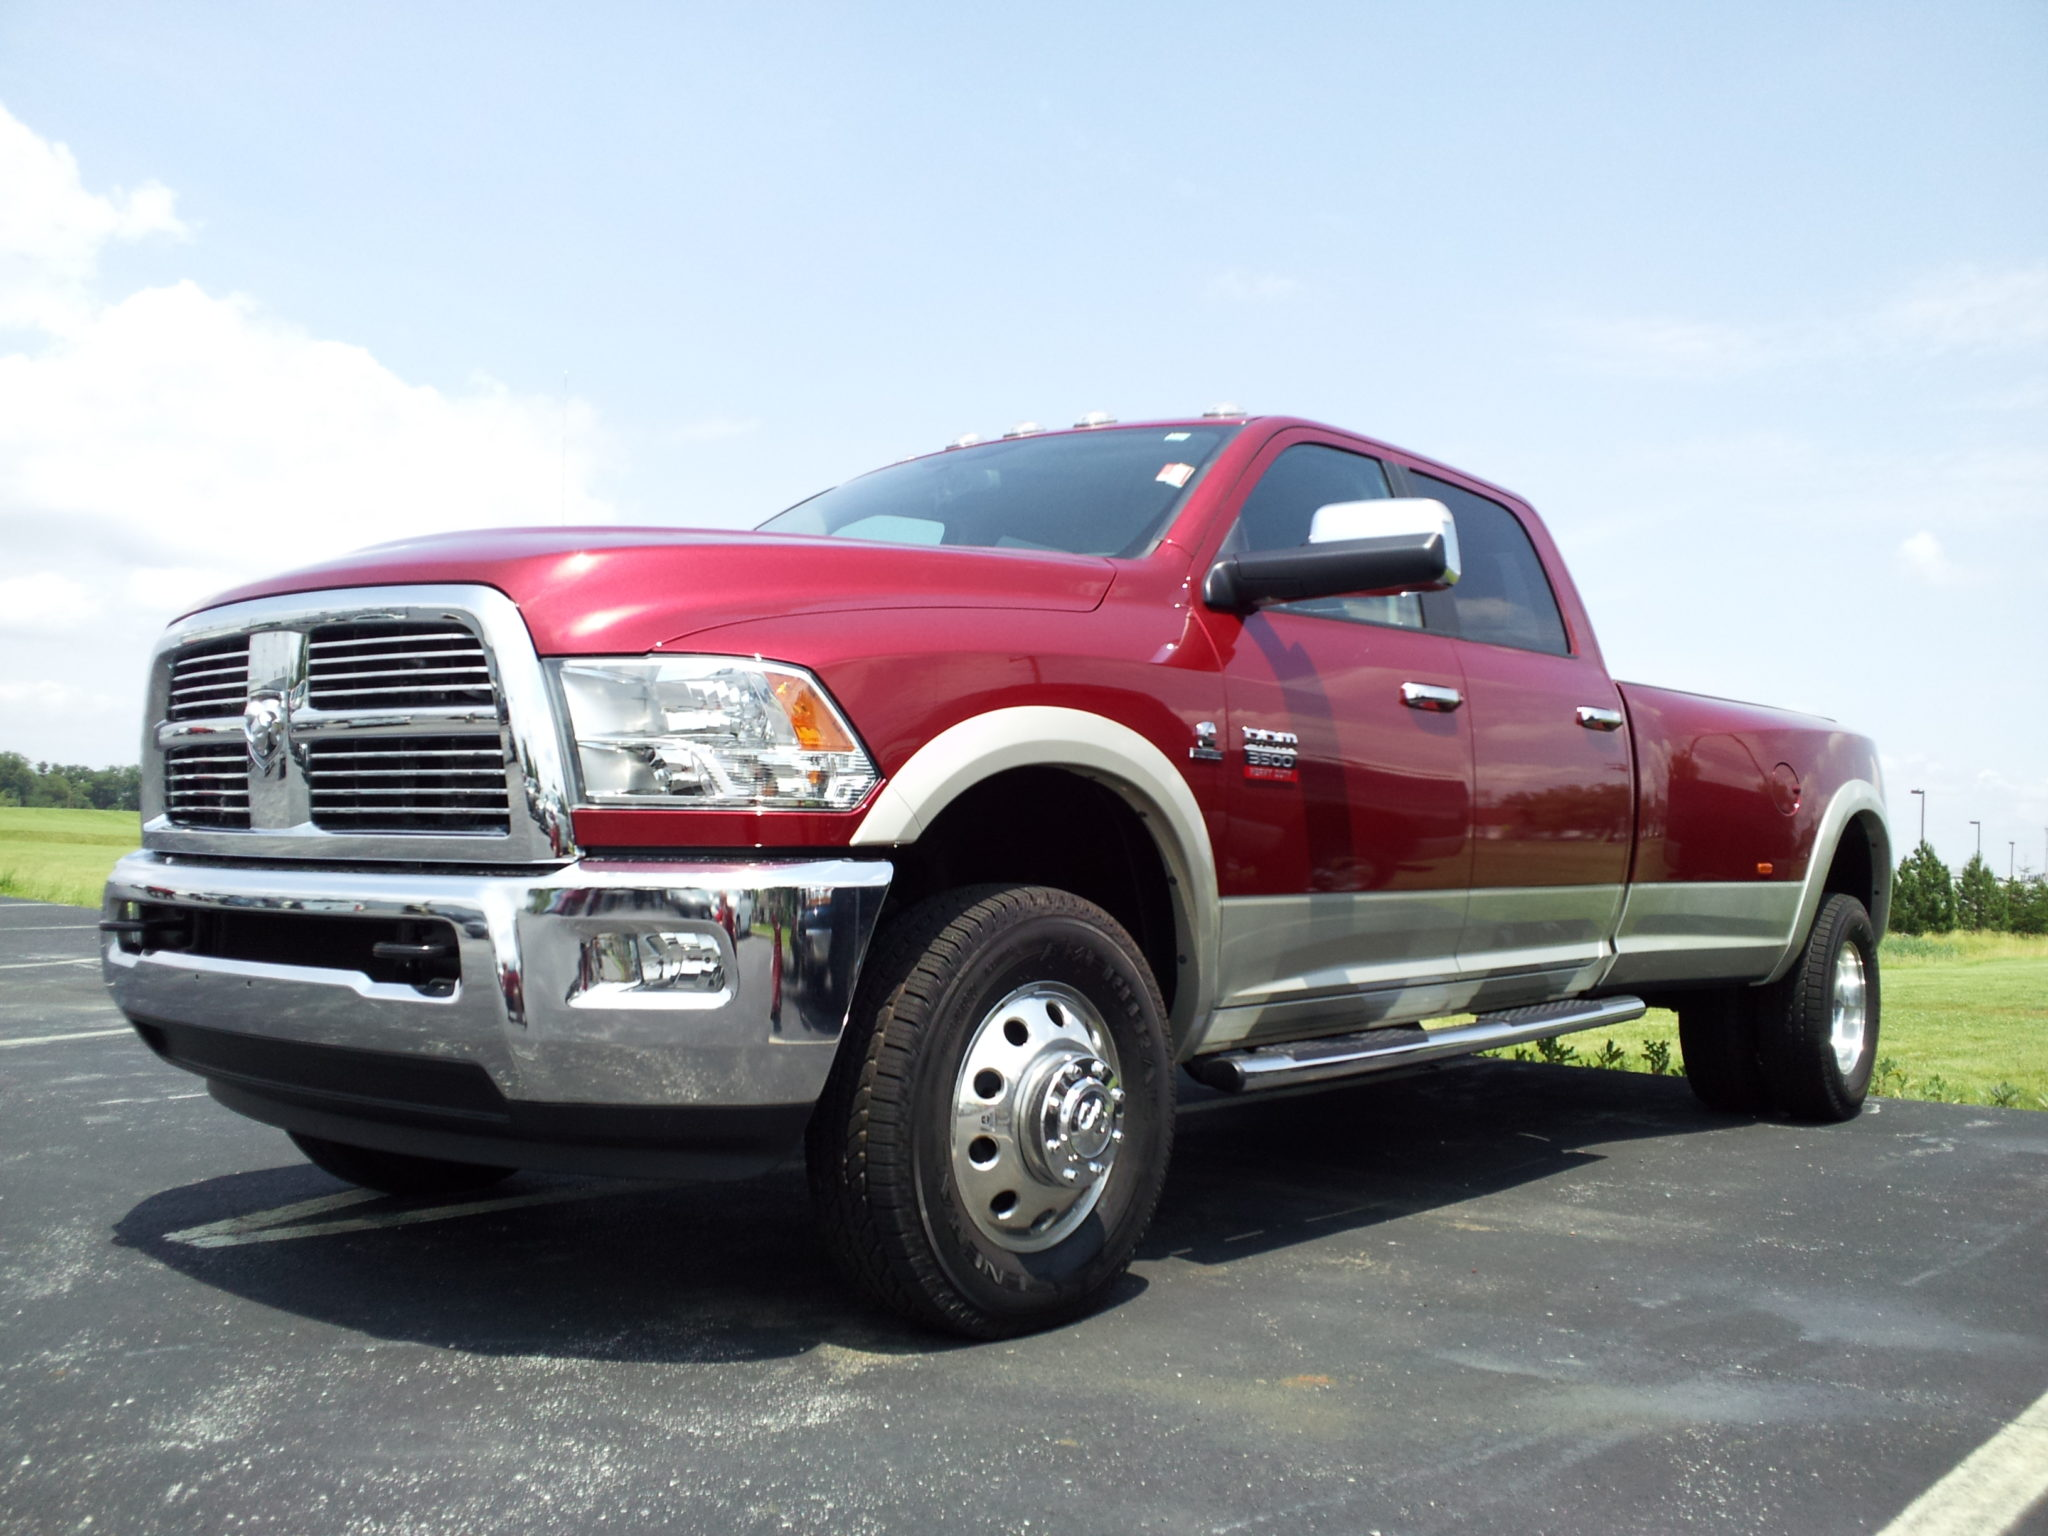 Ram pickup trucks' dilemma: wheels can fall off 2